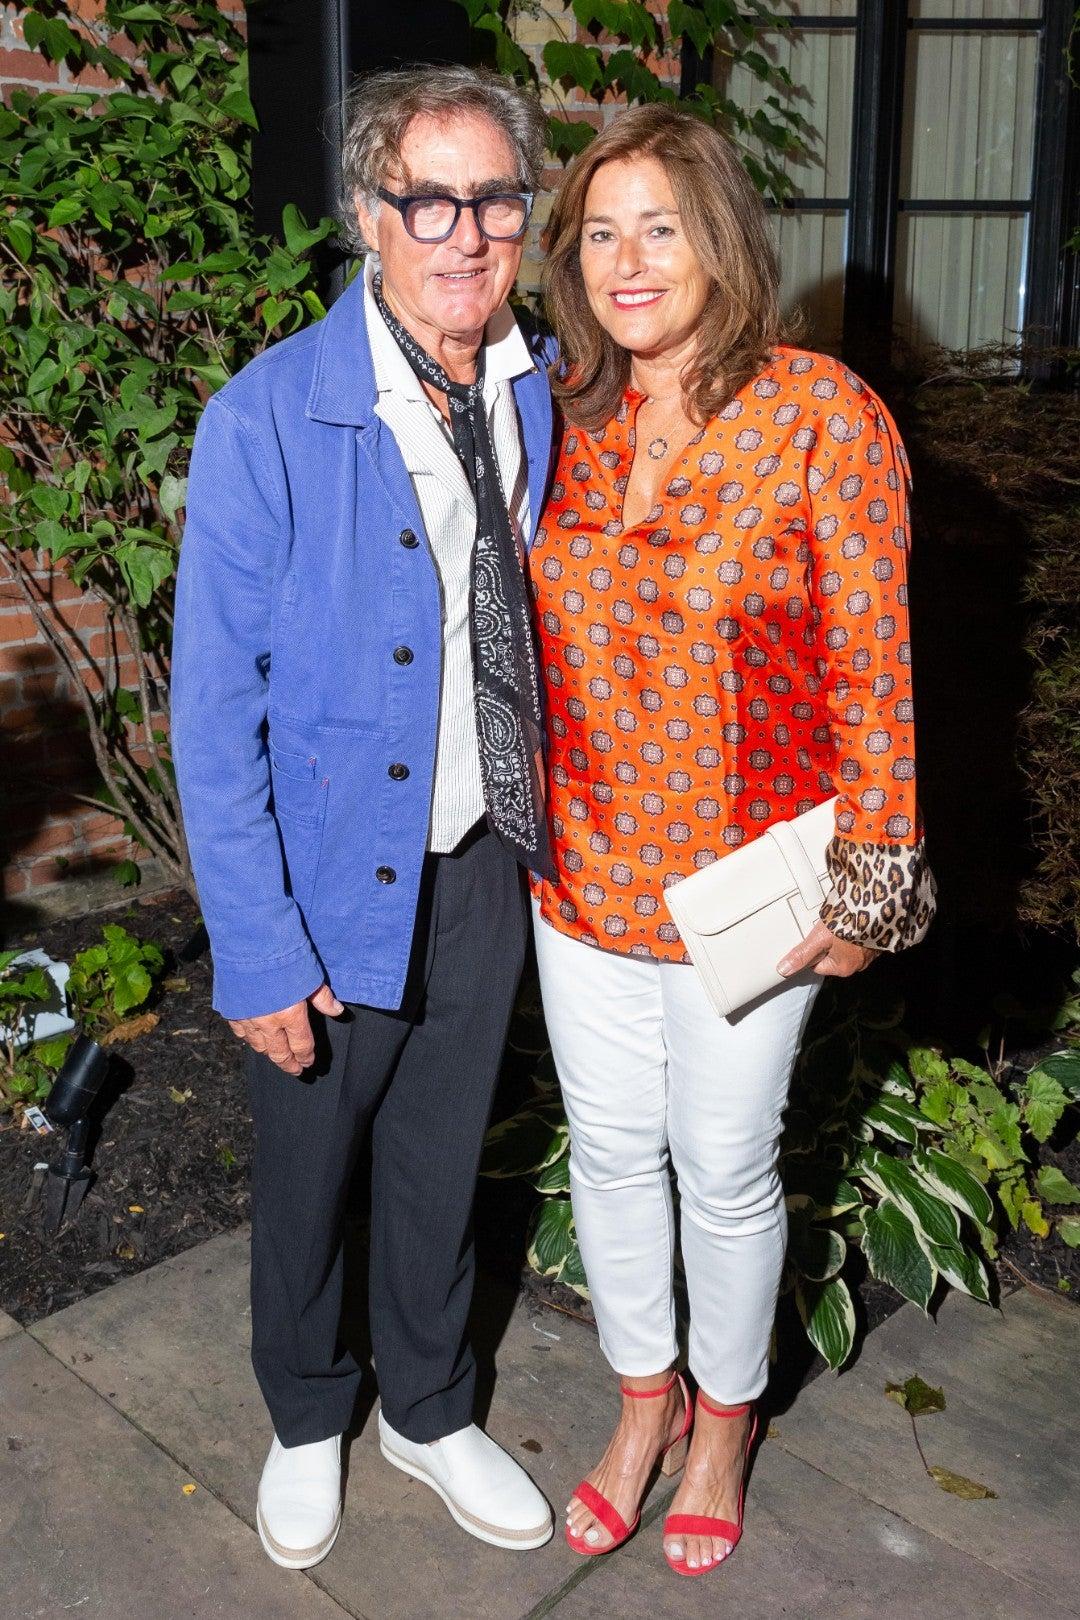 Michael Budman and Diane Bald